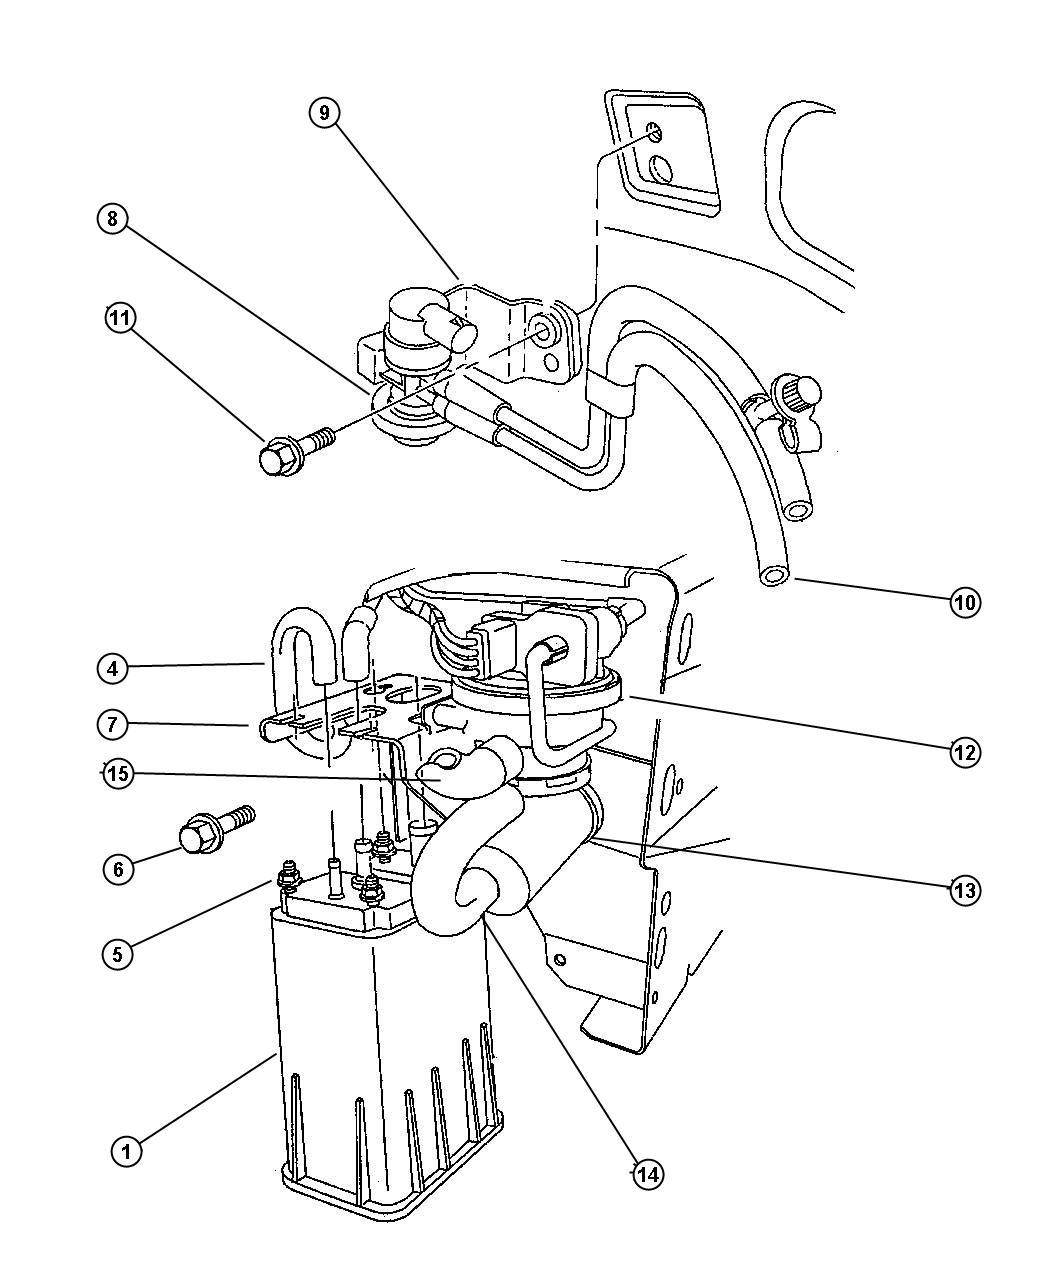 Chrysler Sebring Vapor Canister And Leak Detection Pump